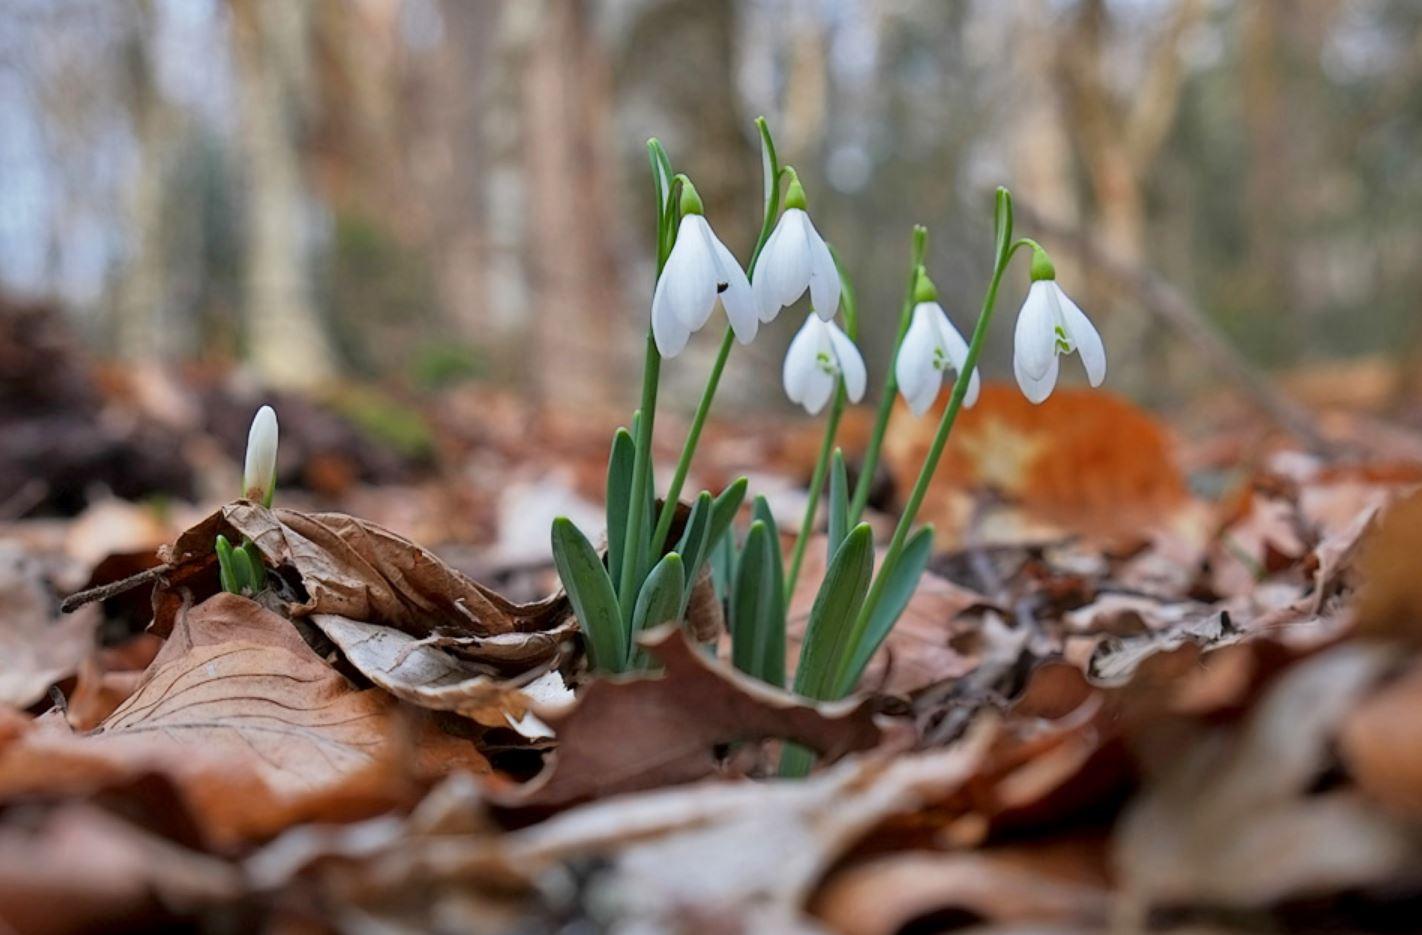 картинки весна природа (20)